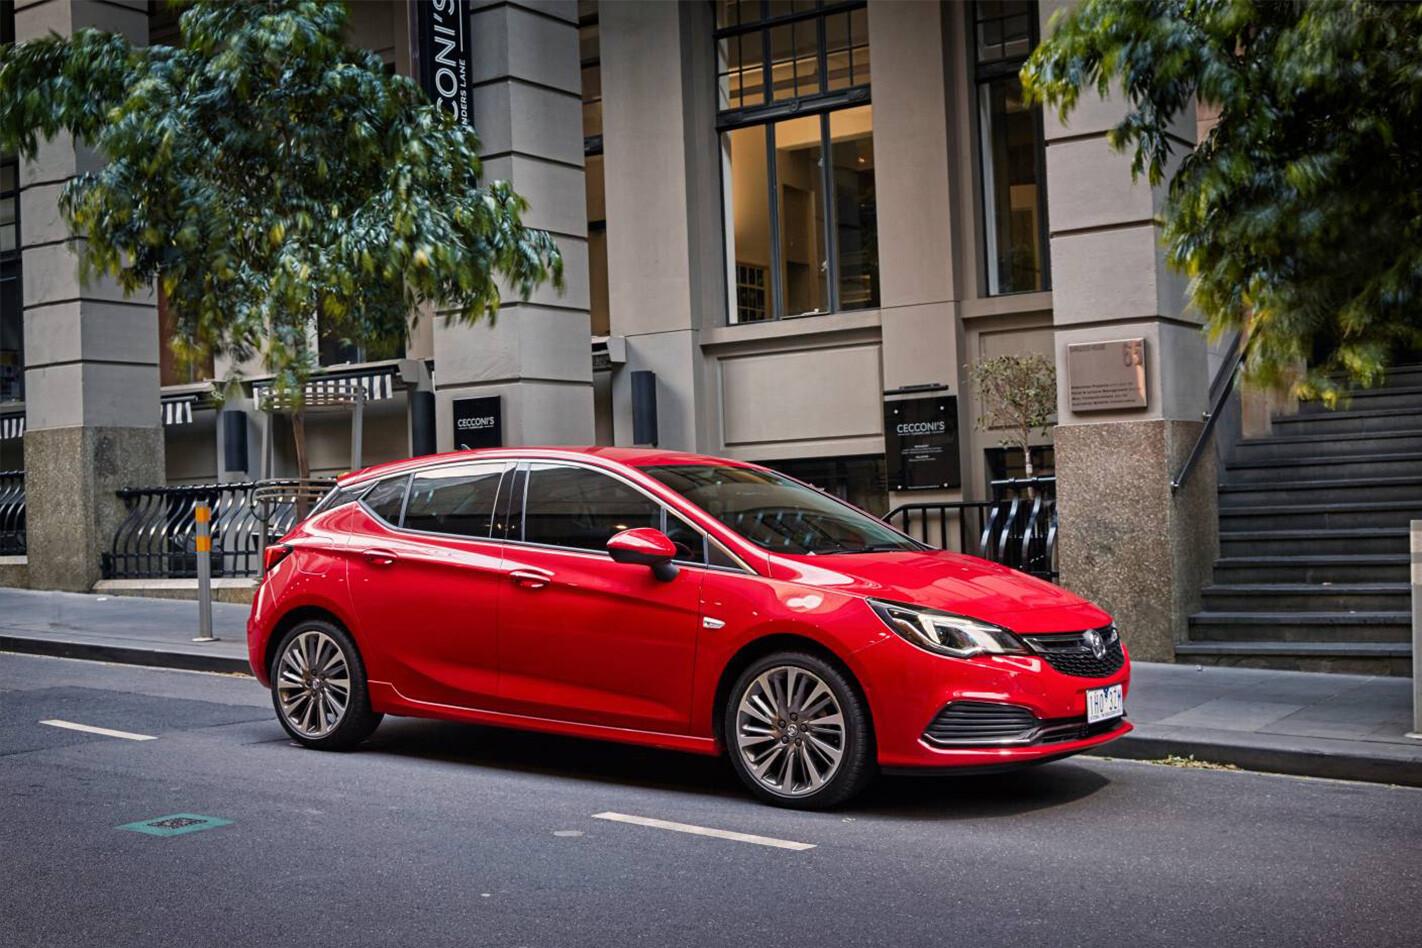 Vfacts Wc Holden Astra Jpg